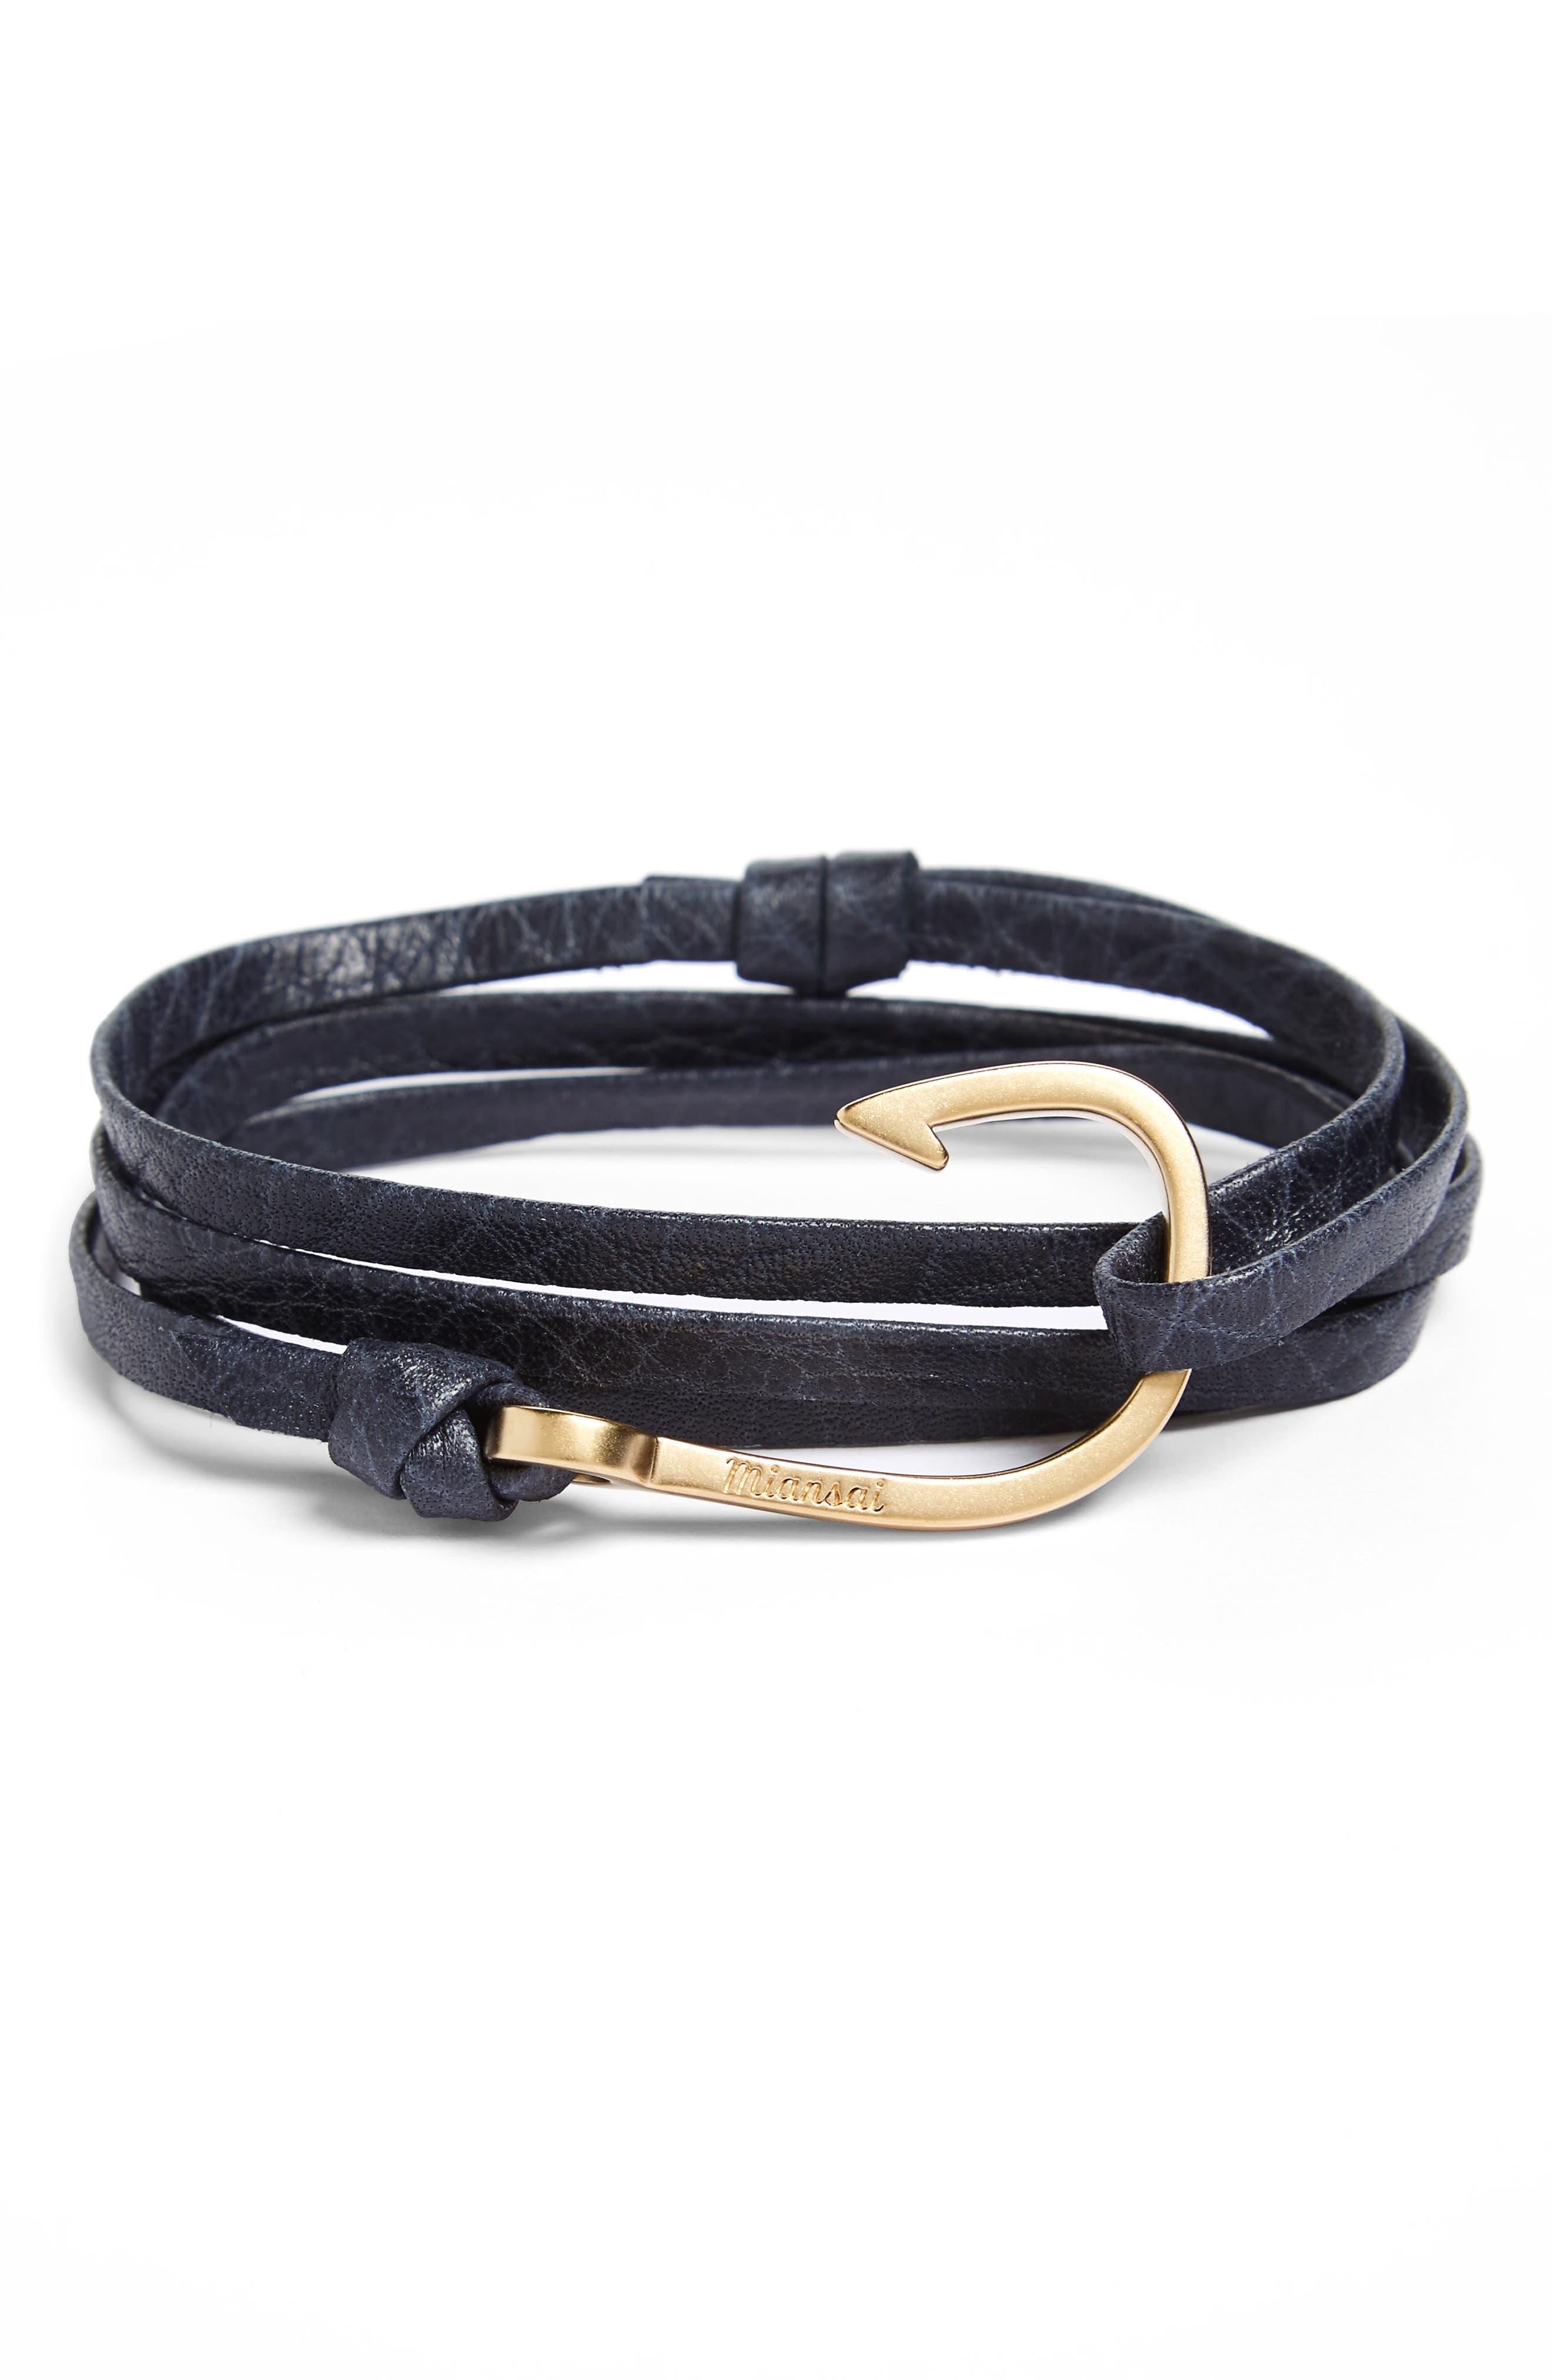 Alternate Image 1 Selected - Miansai Hook On Leather Wrap Bracelet